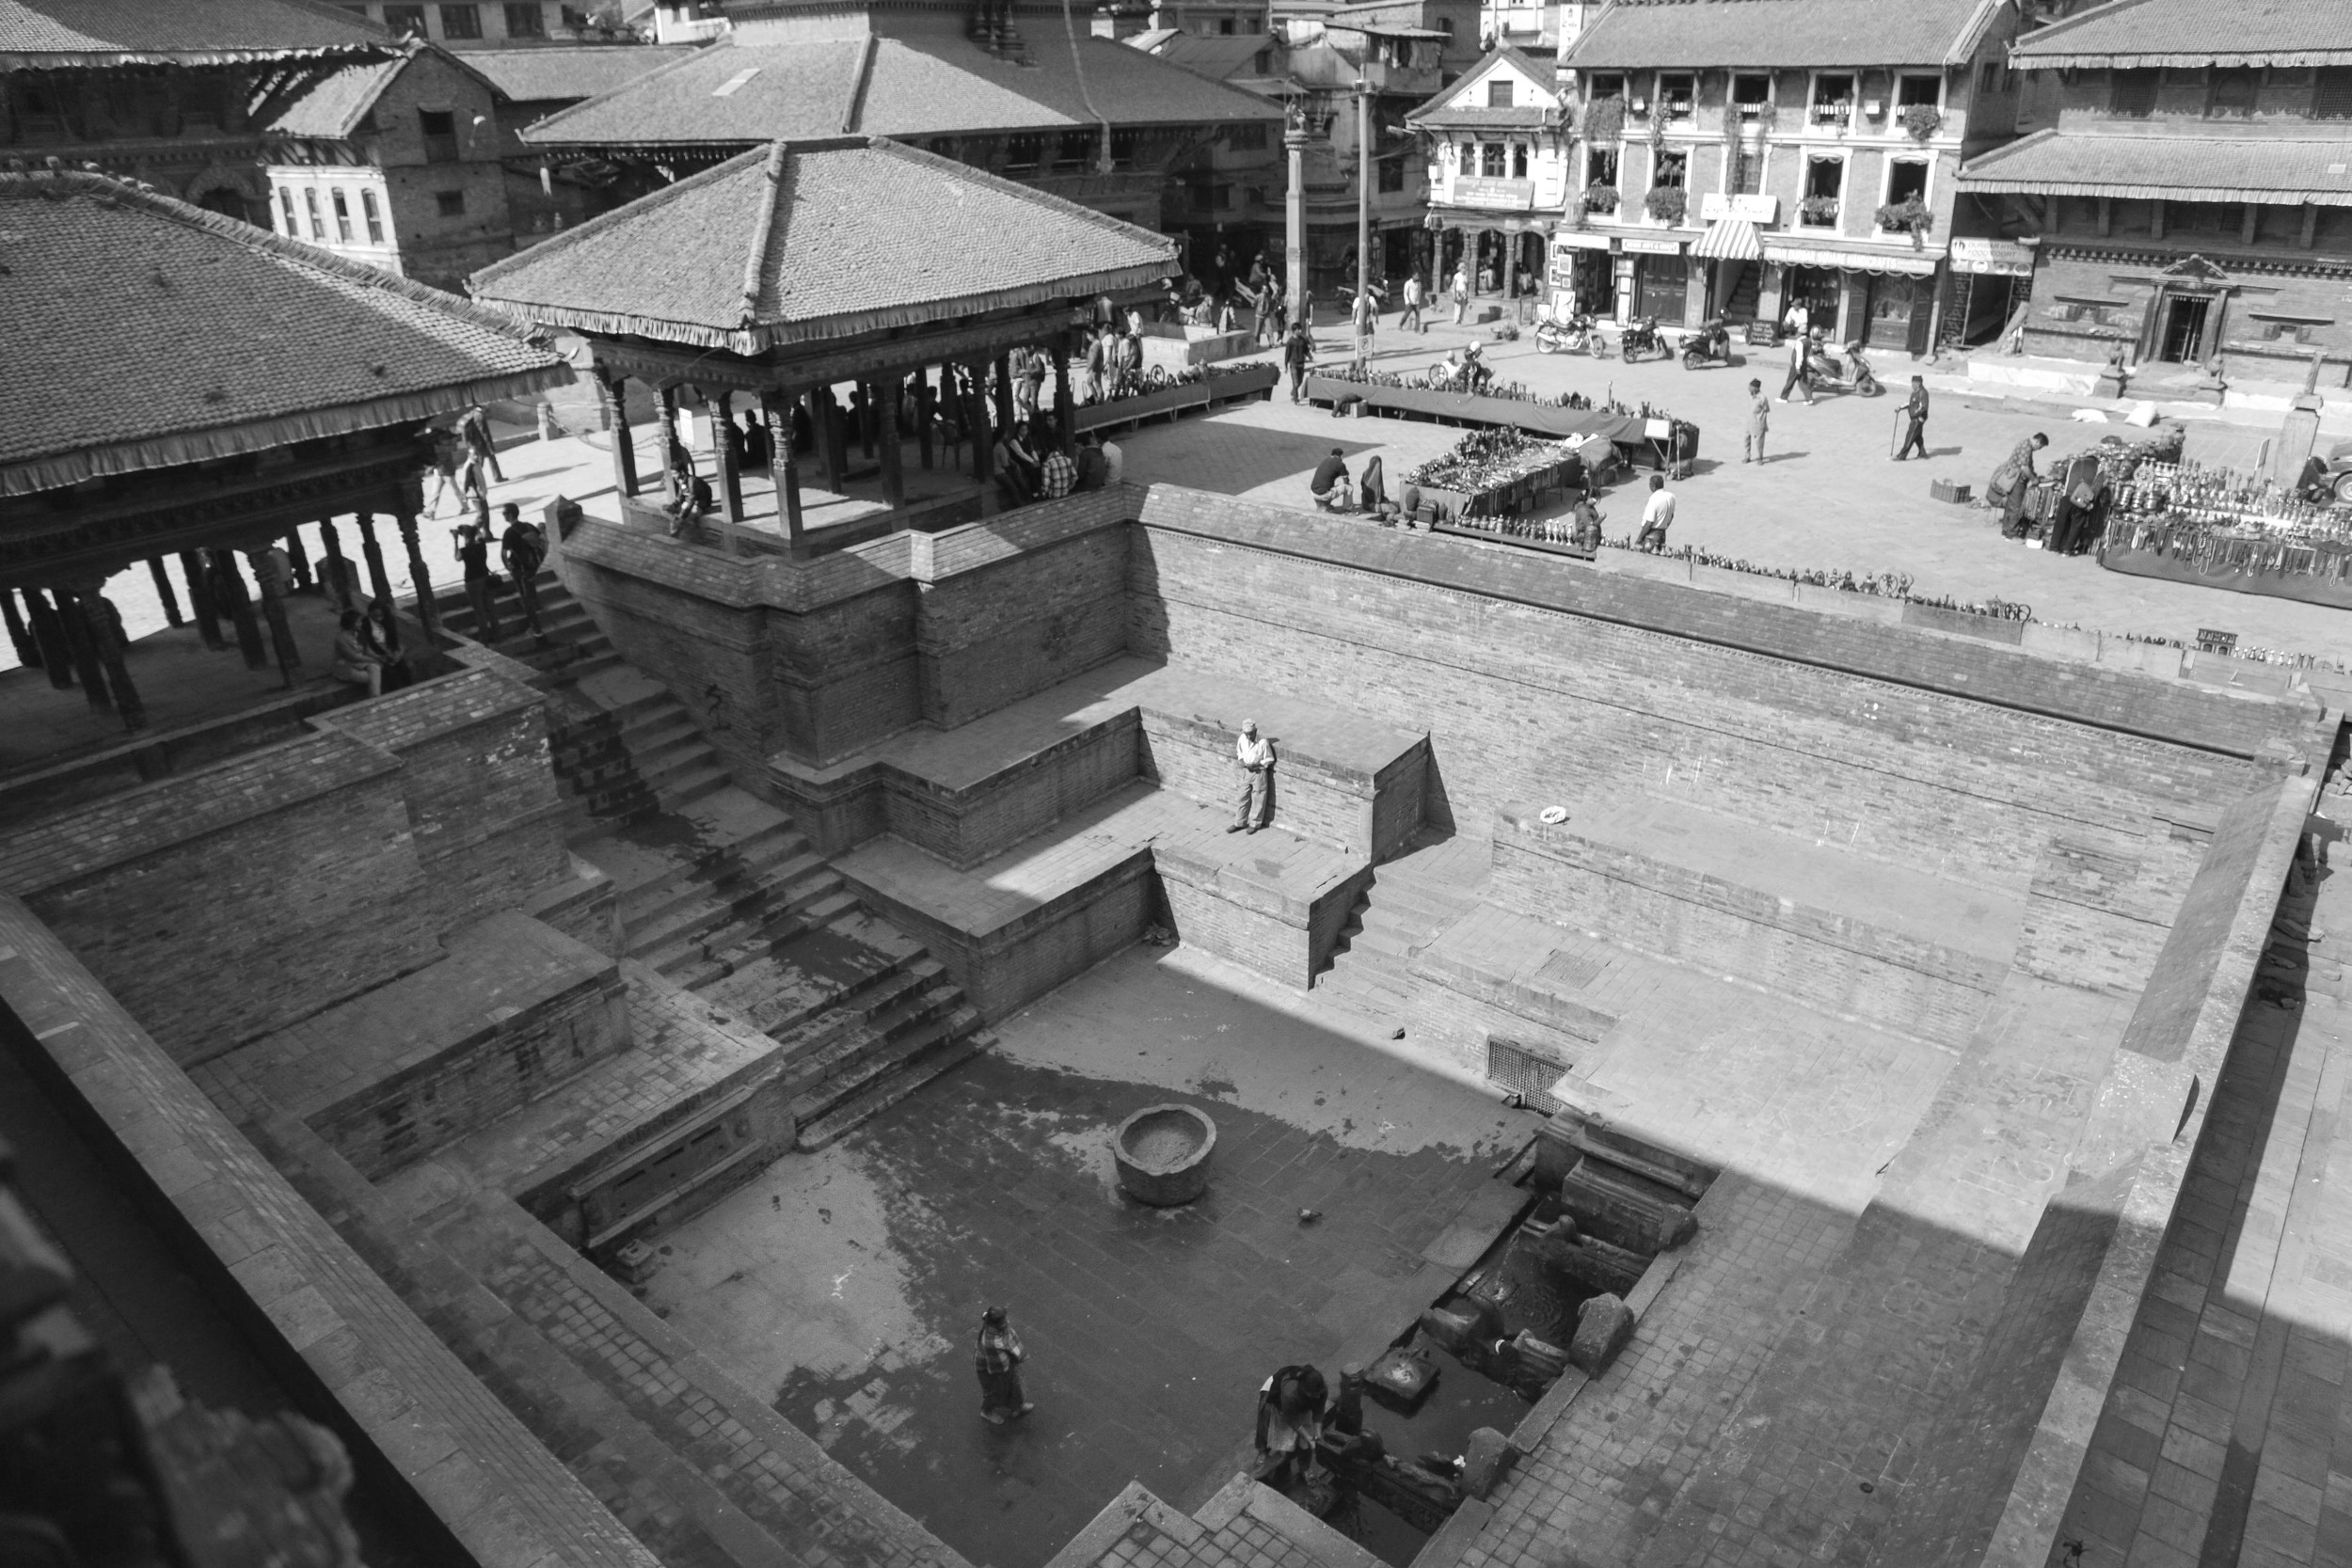 Mangaa H  iti,built around570 AD, at the Patan Durbar Square on Mangal Bazaar